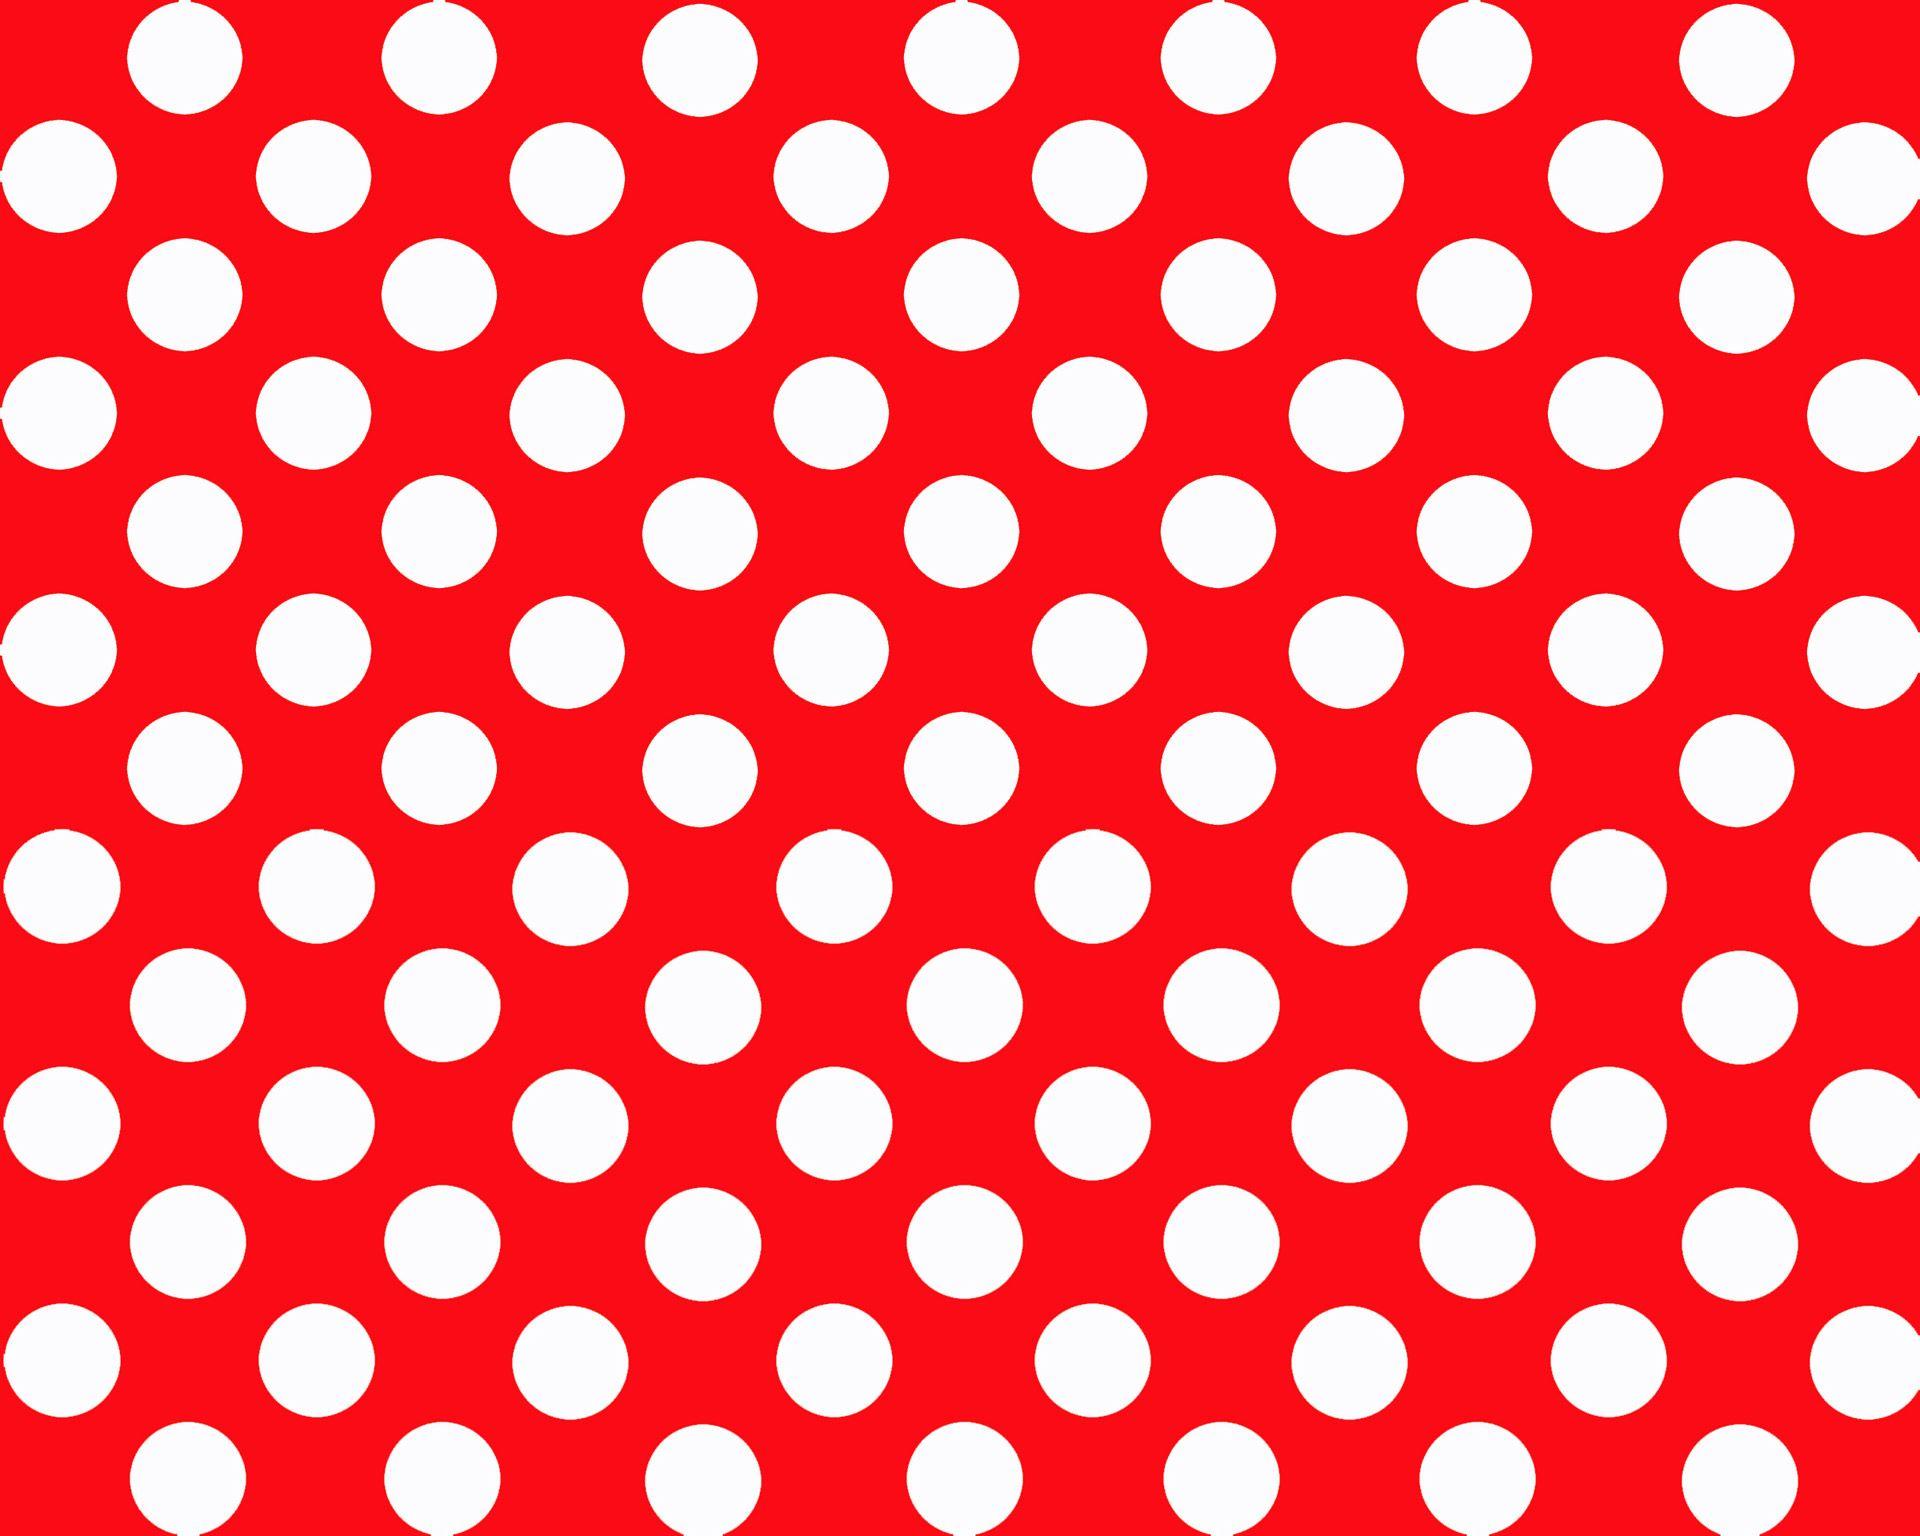 Pin By Lauren On Phones Pink Polka Dots Background Polka Dot Background Pink Polka Dots